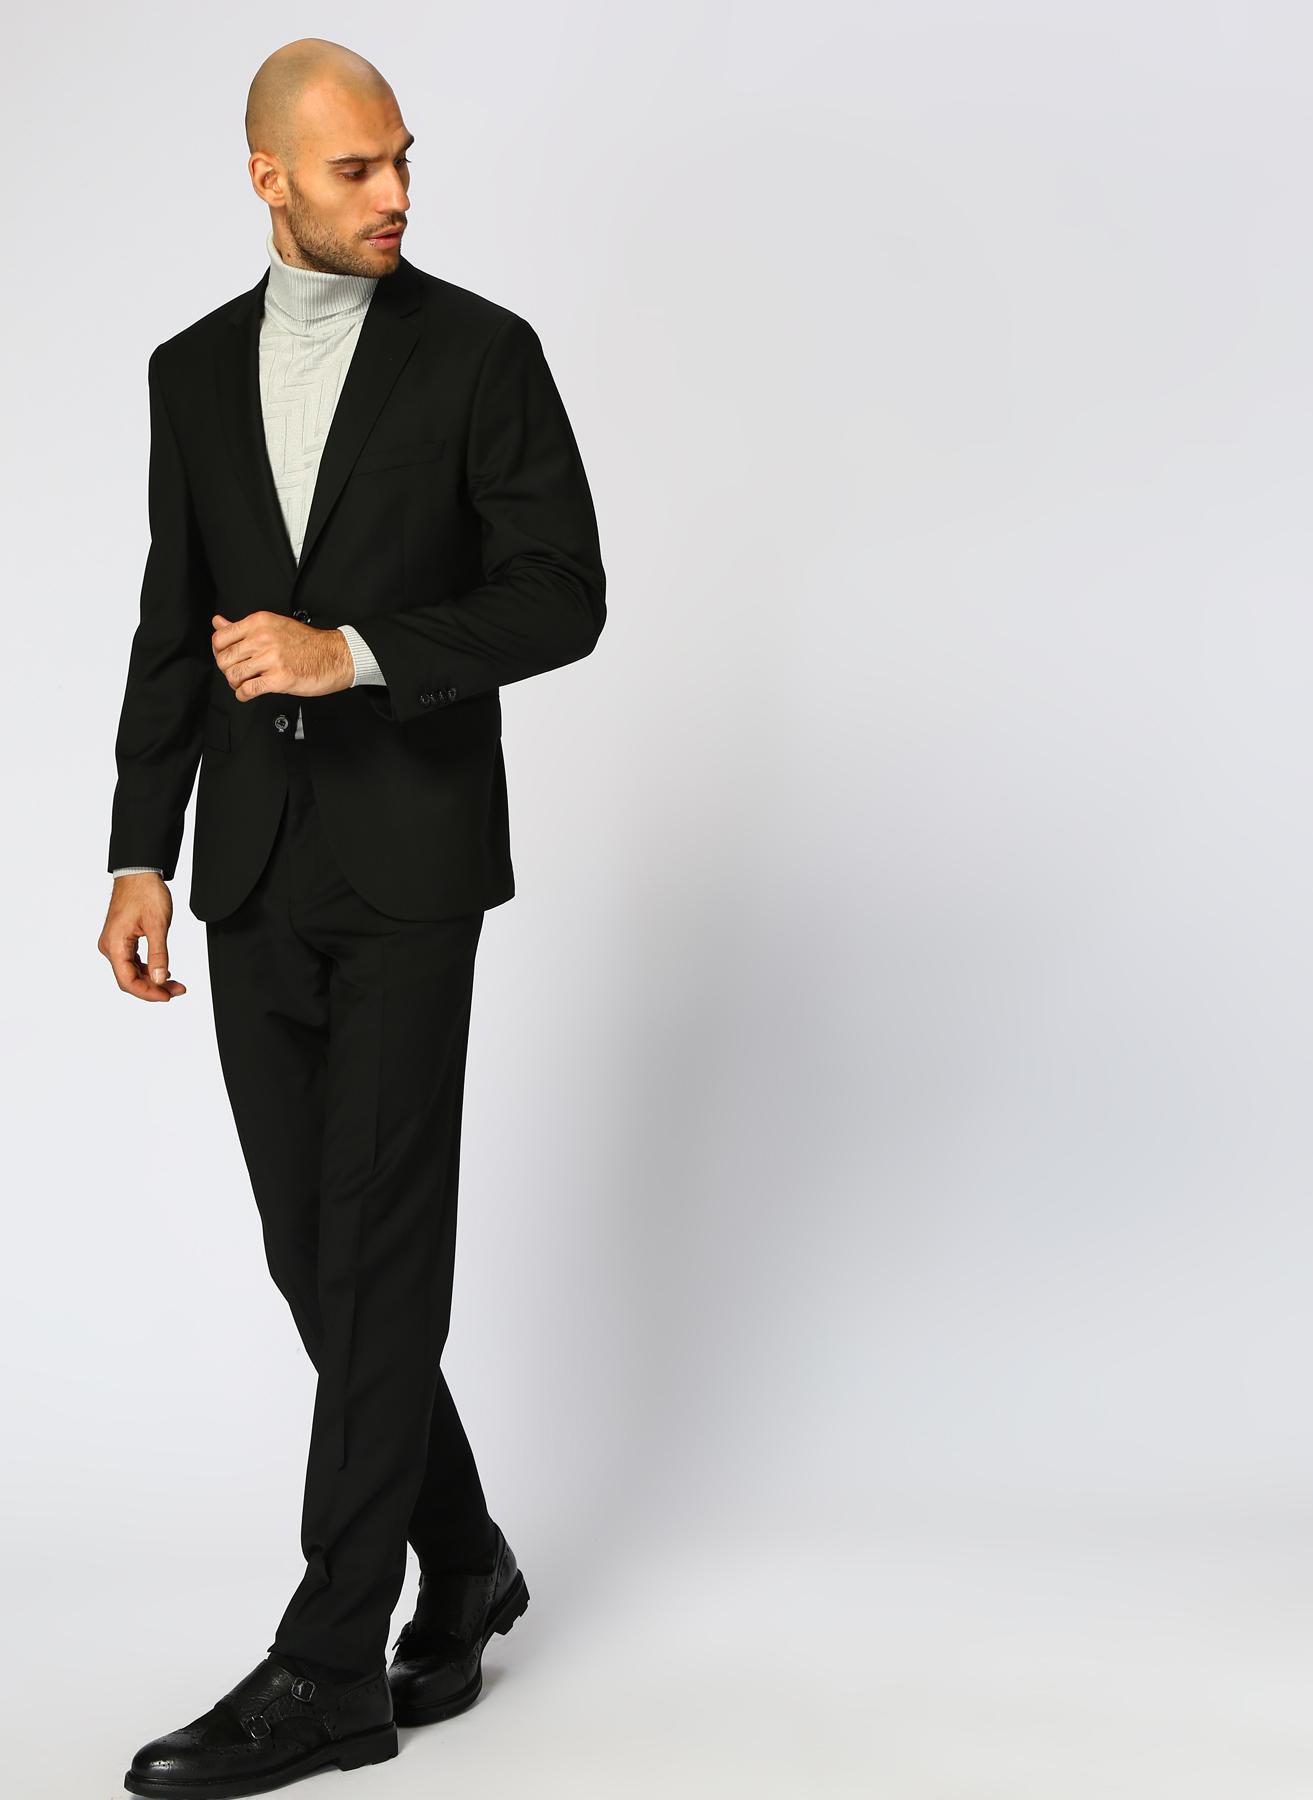 George Hogg Slim Fit Siyah Takım Elbise 56-6 5001699454006 Ürün Resmi